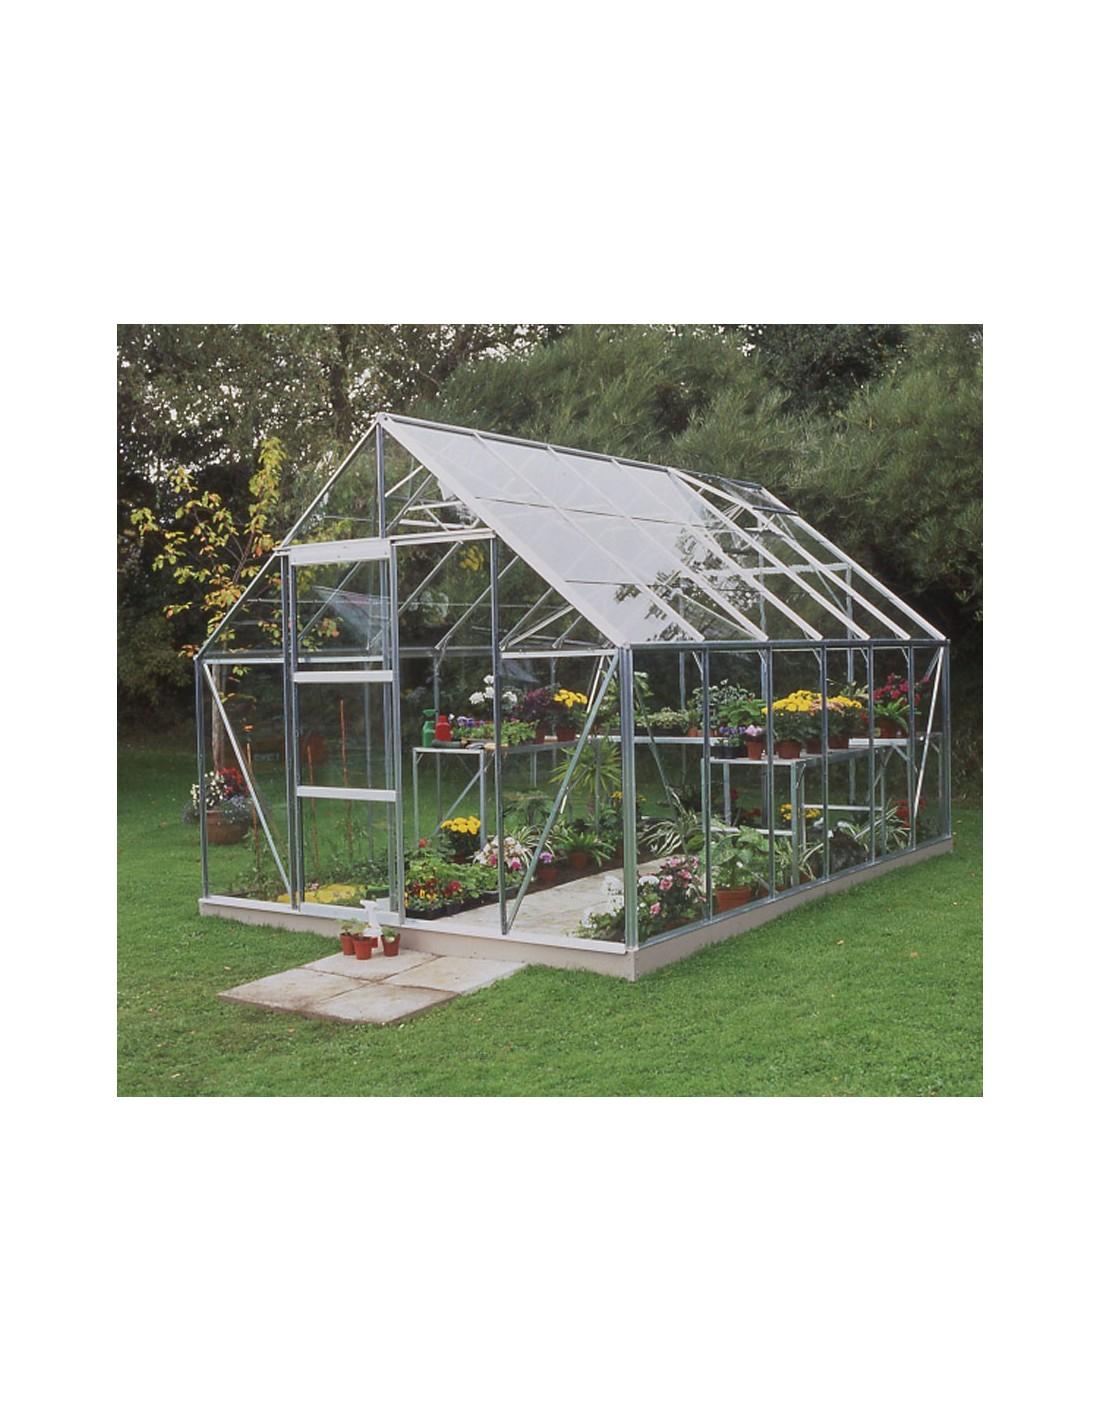 Serre de jardin universal 9 9 m verre horticole de 3 mm - Serre de jardin en verre horticole ...